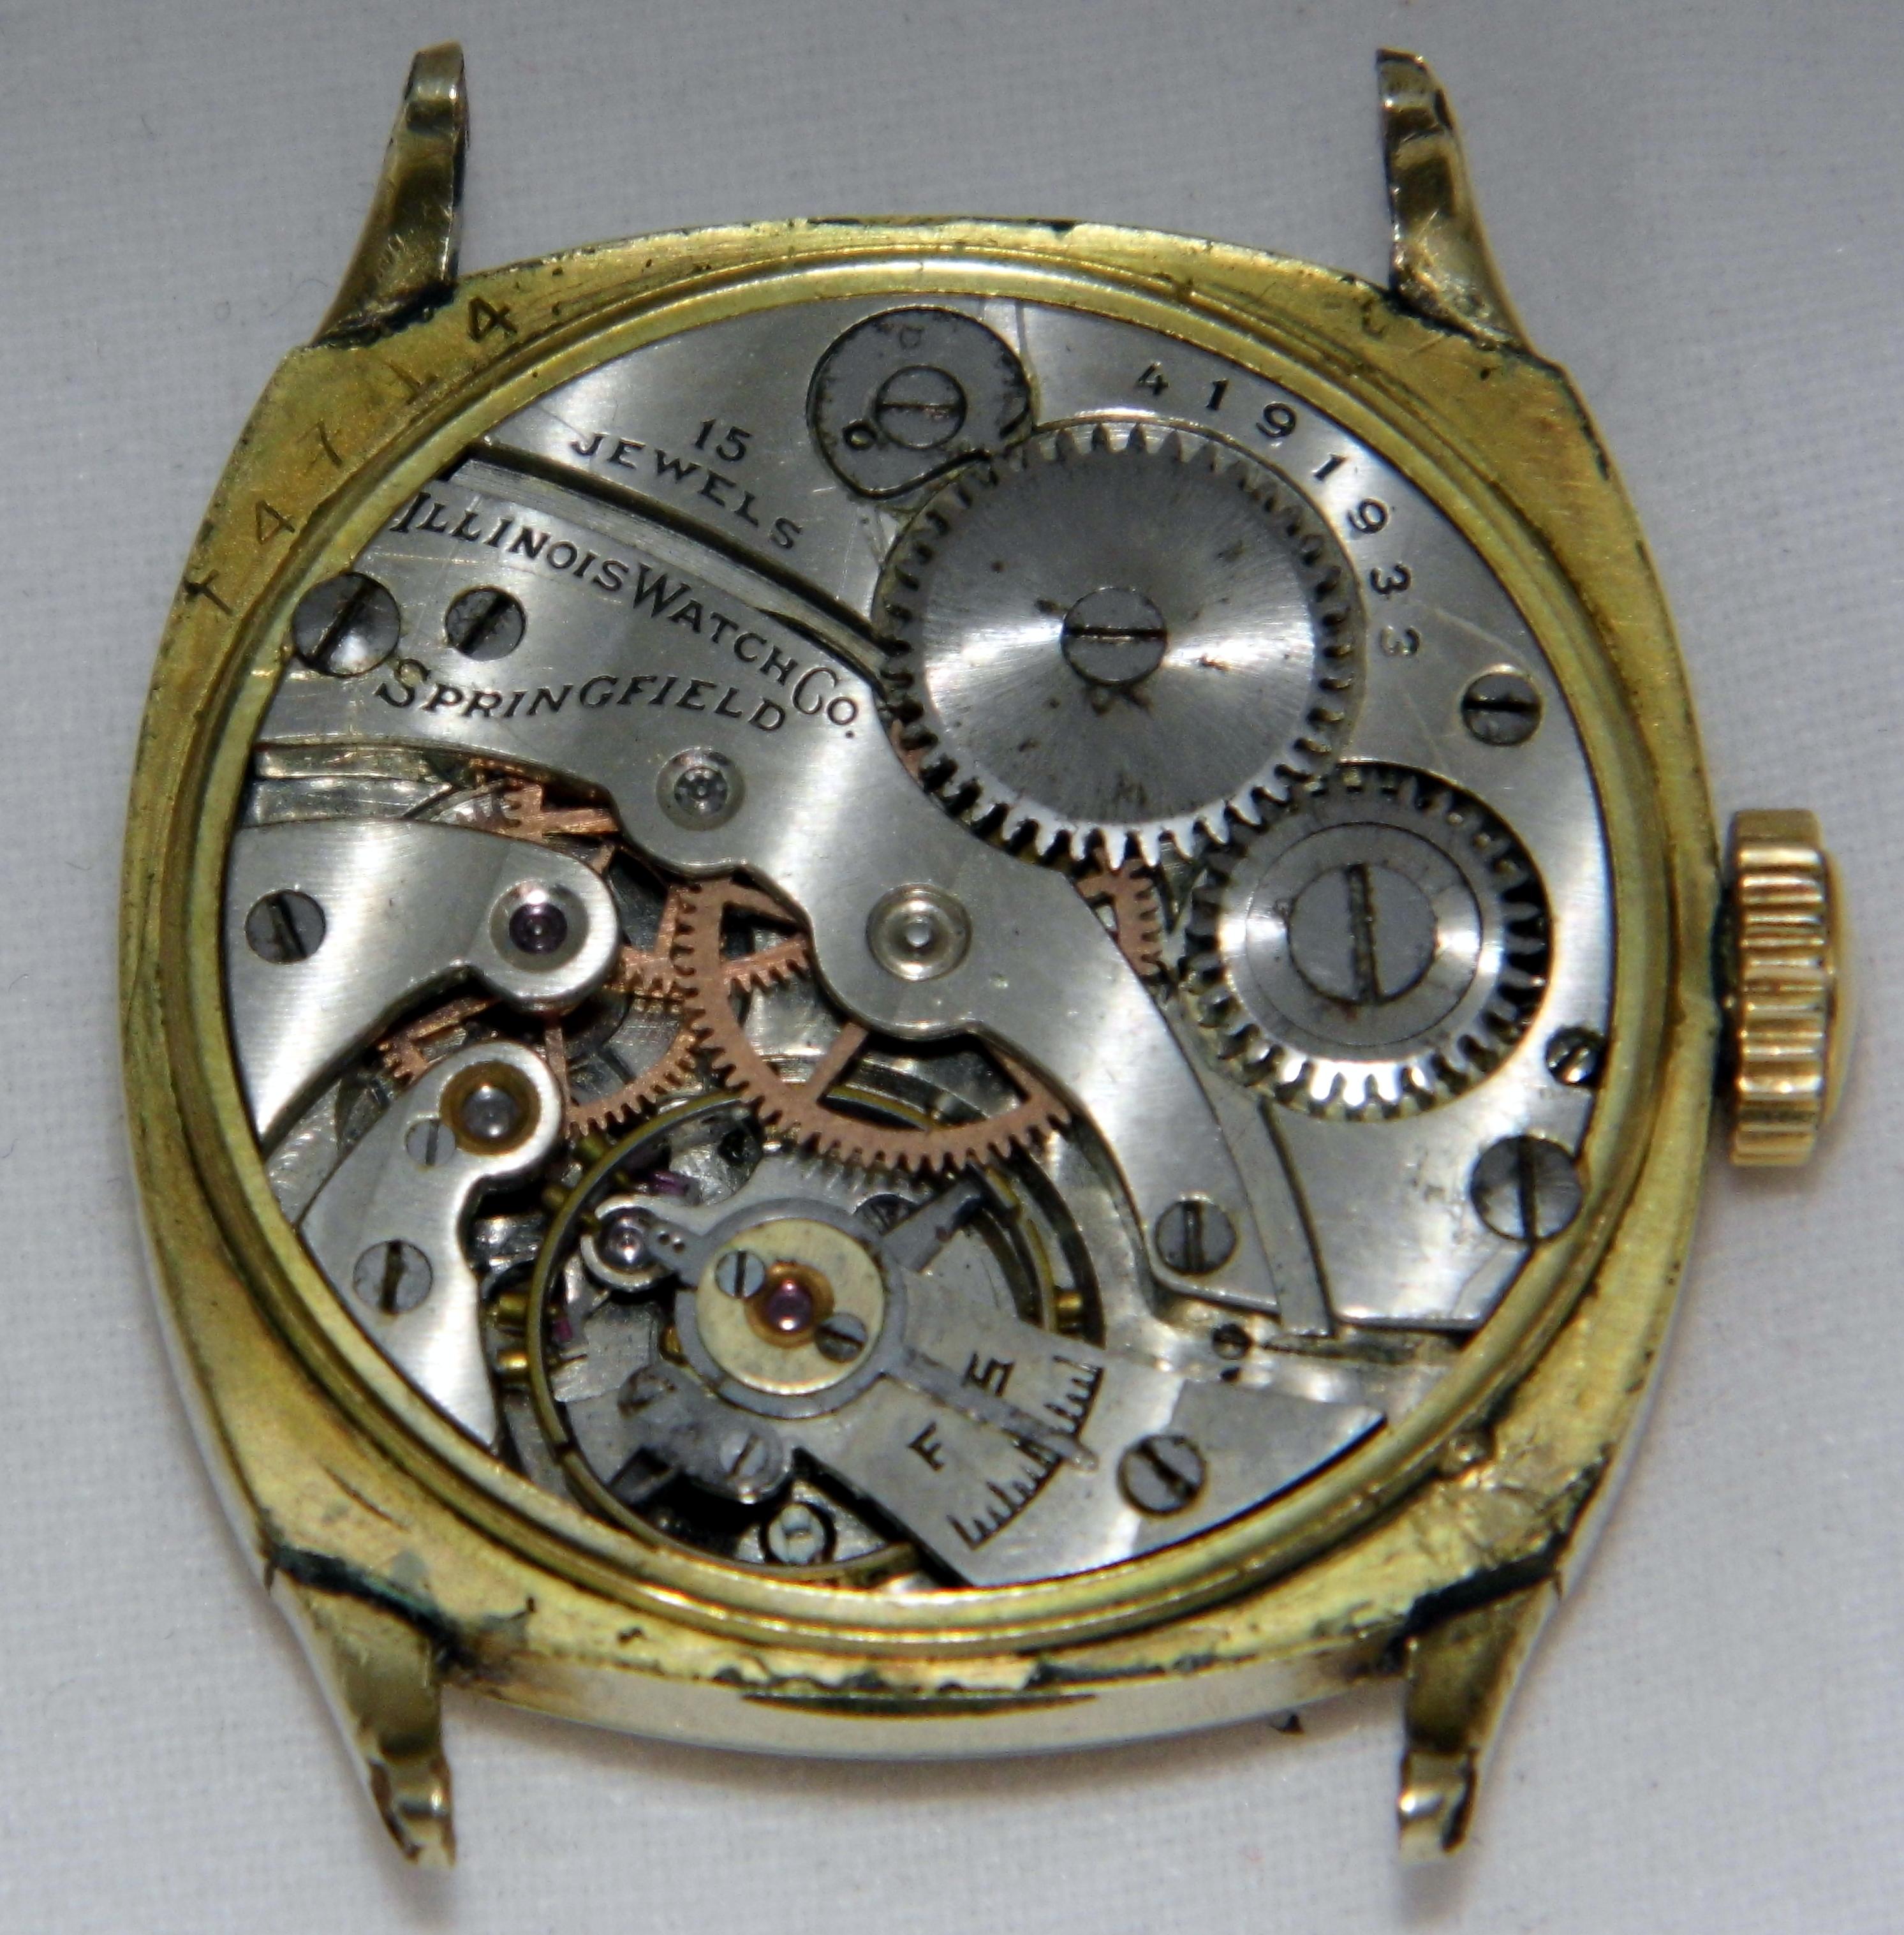 file vintage illinois watch co mens wrist watch 15 jewels grade file vintage illinois watch co mens wrist watch 15 jewels grade 903